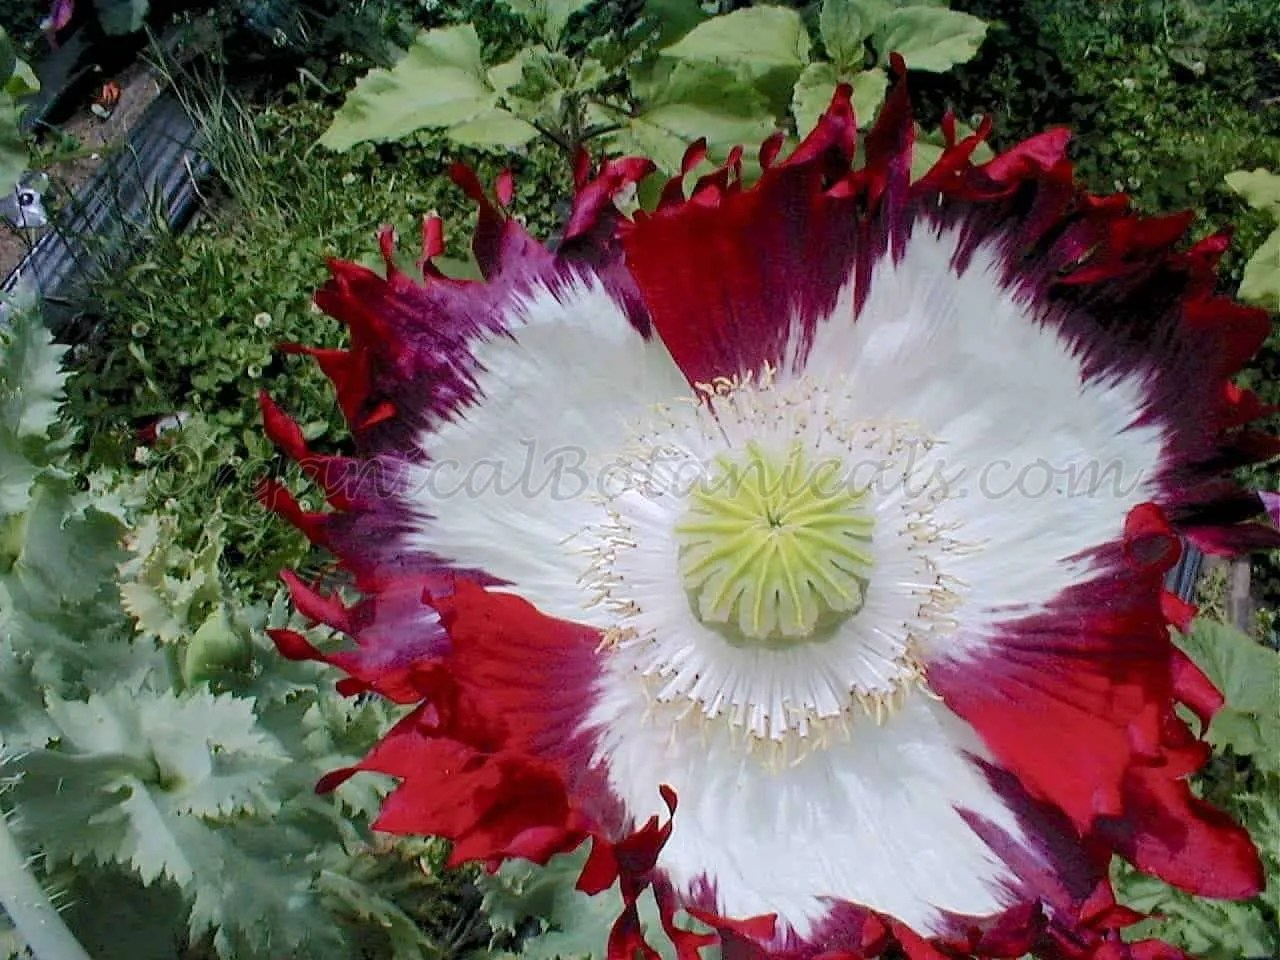 100 Usa Flag Papaver Somniferum Poppy Seeds New Organical